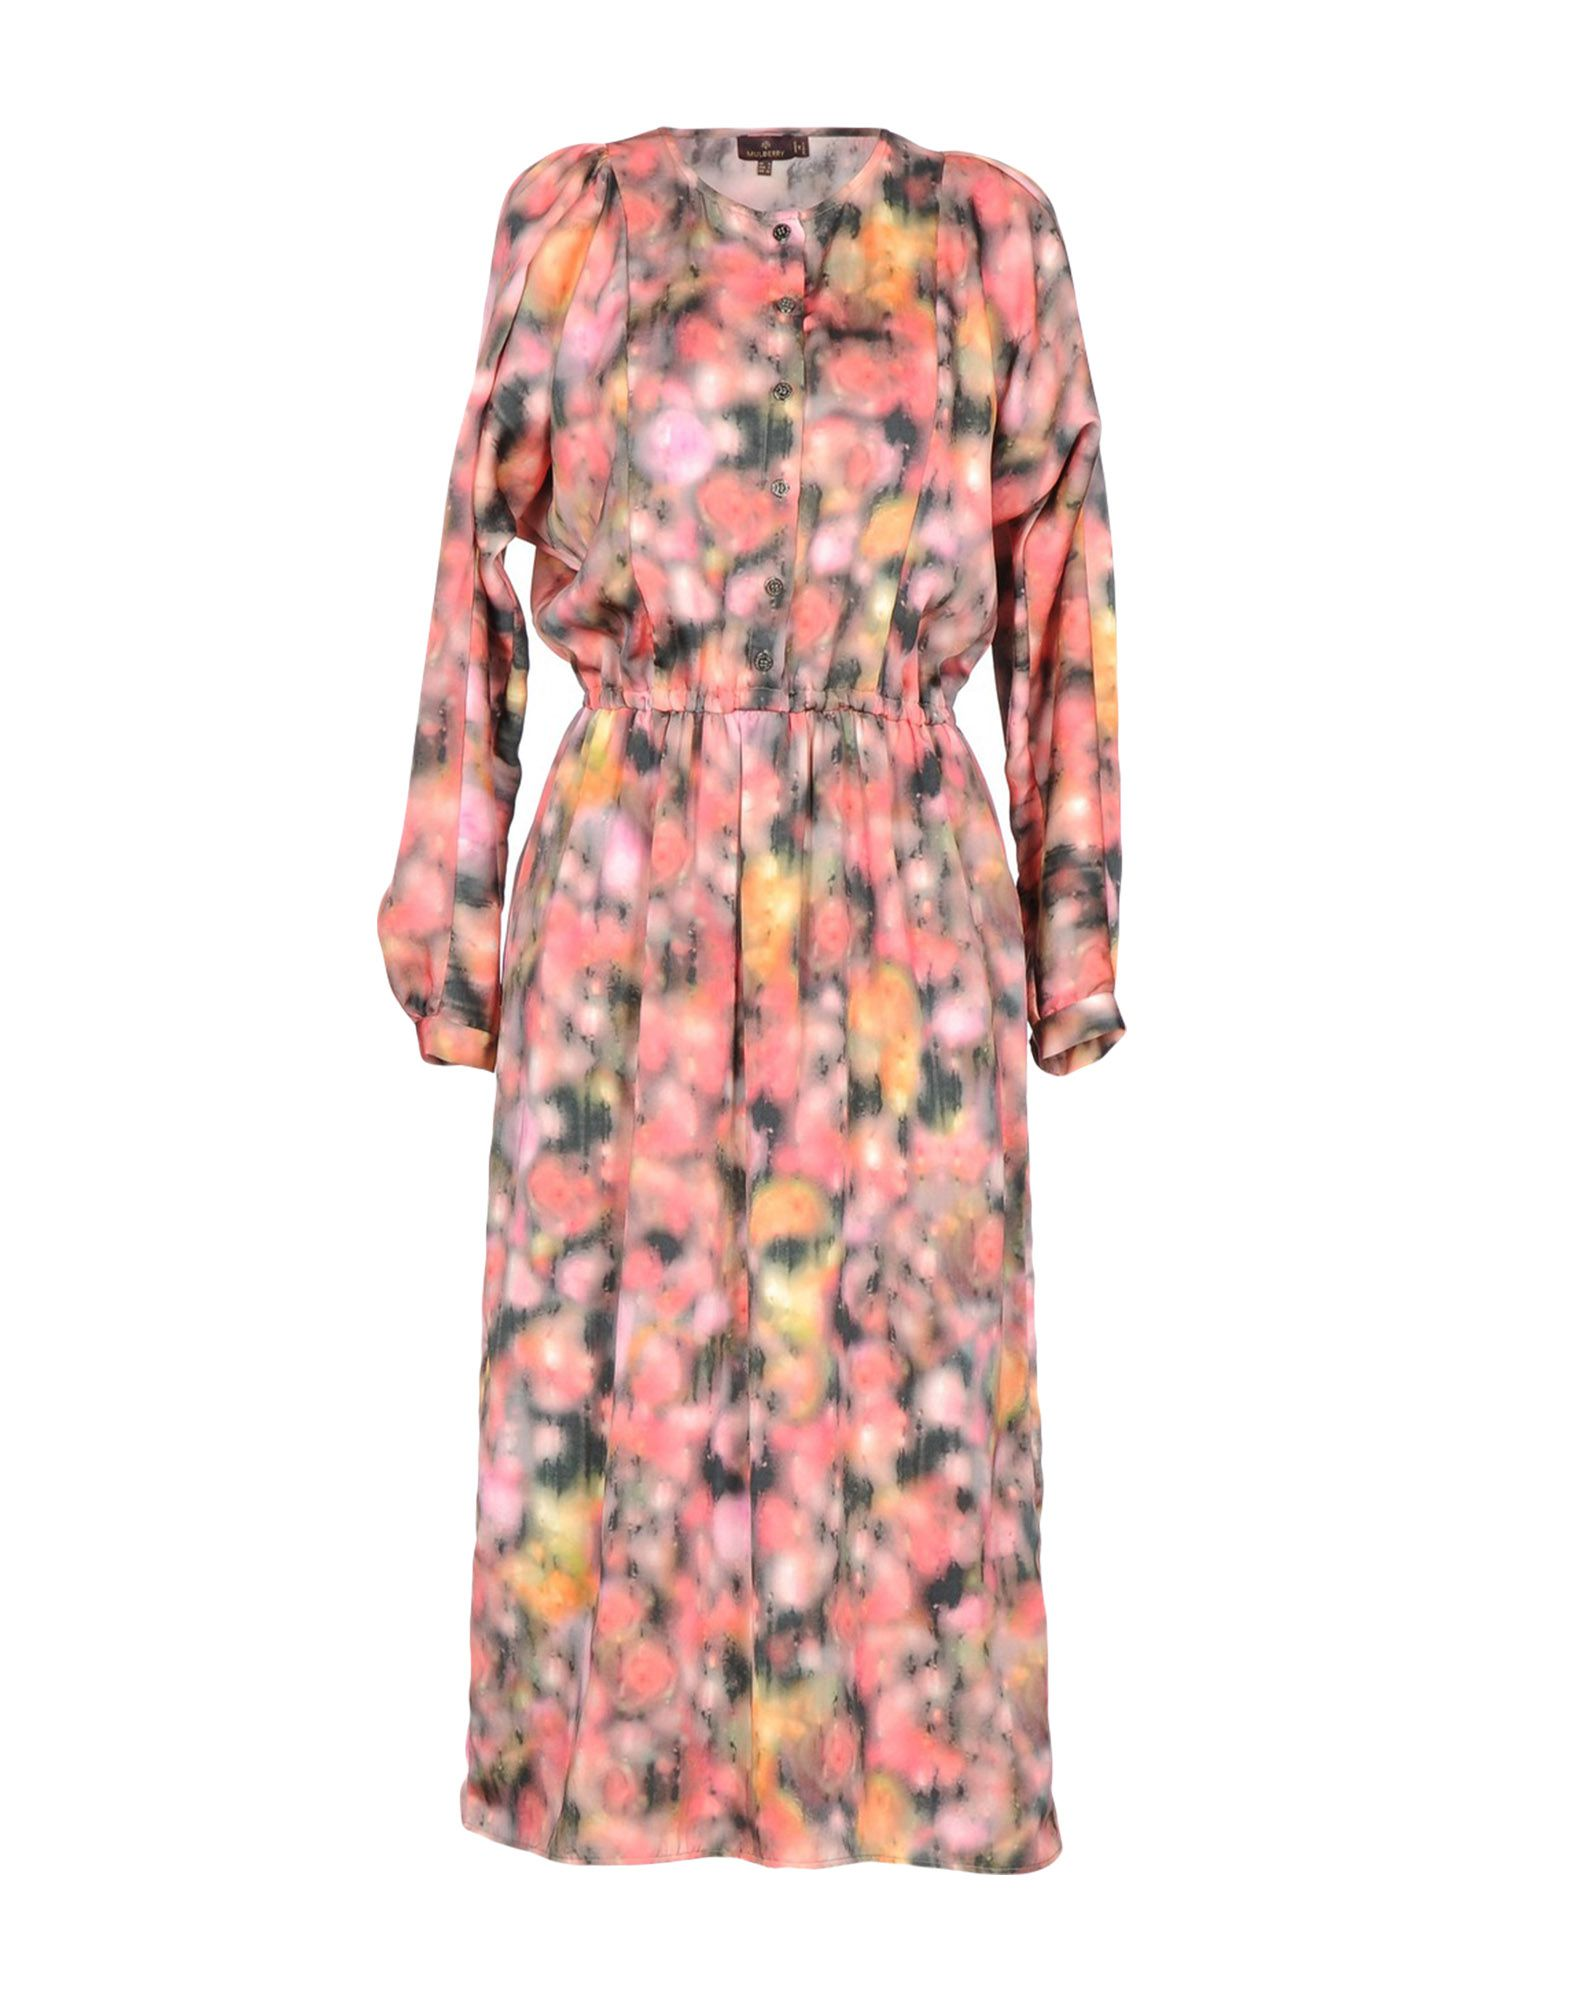 JEAN PAUL GAULTIER MAILLE FEMME Длинное платье jean paul gaultier платье до колена